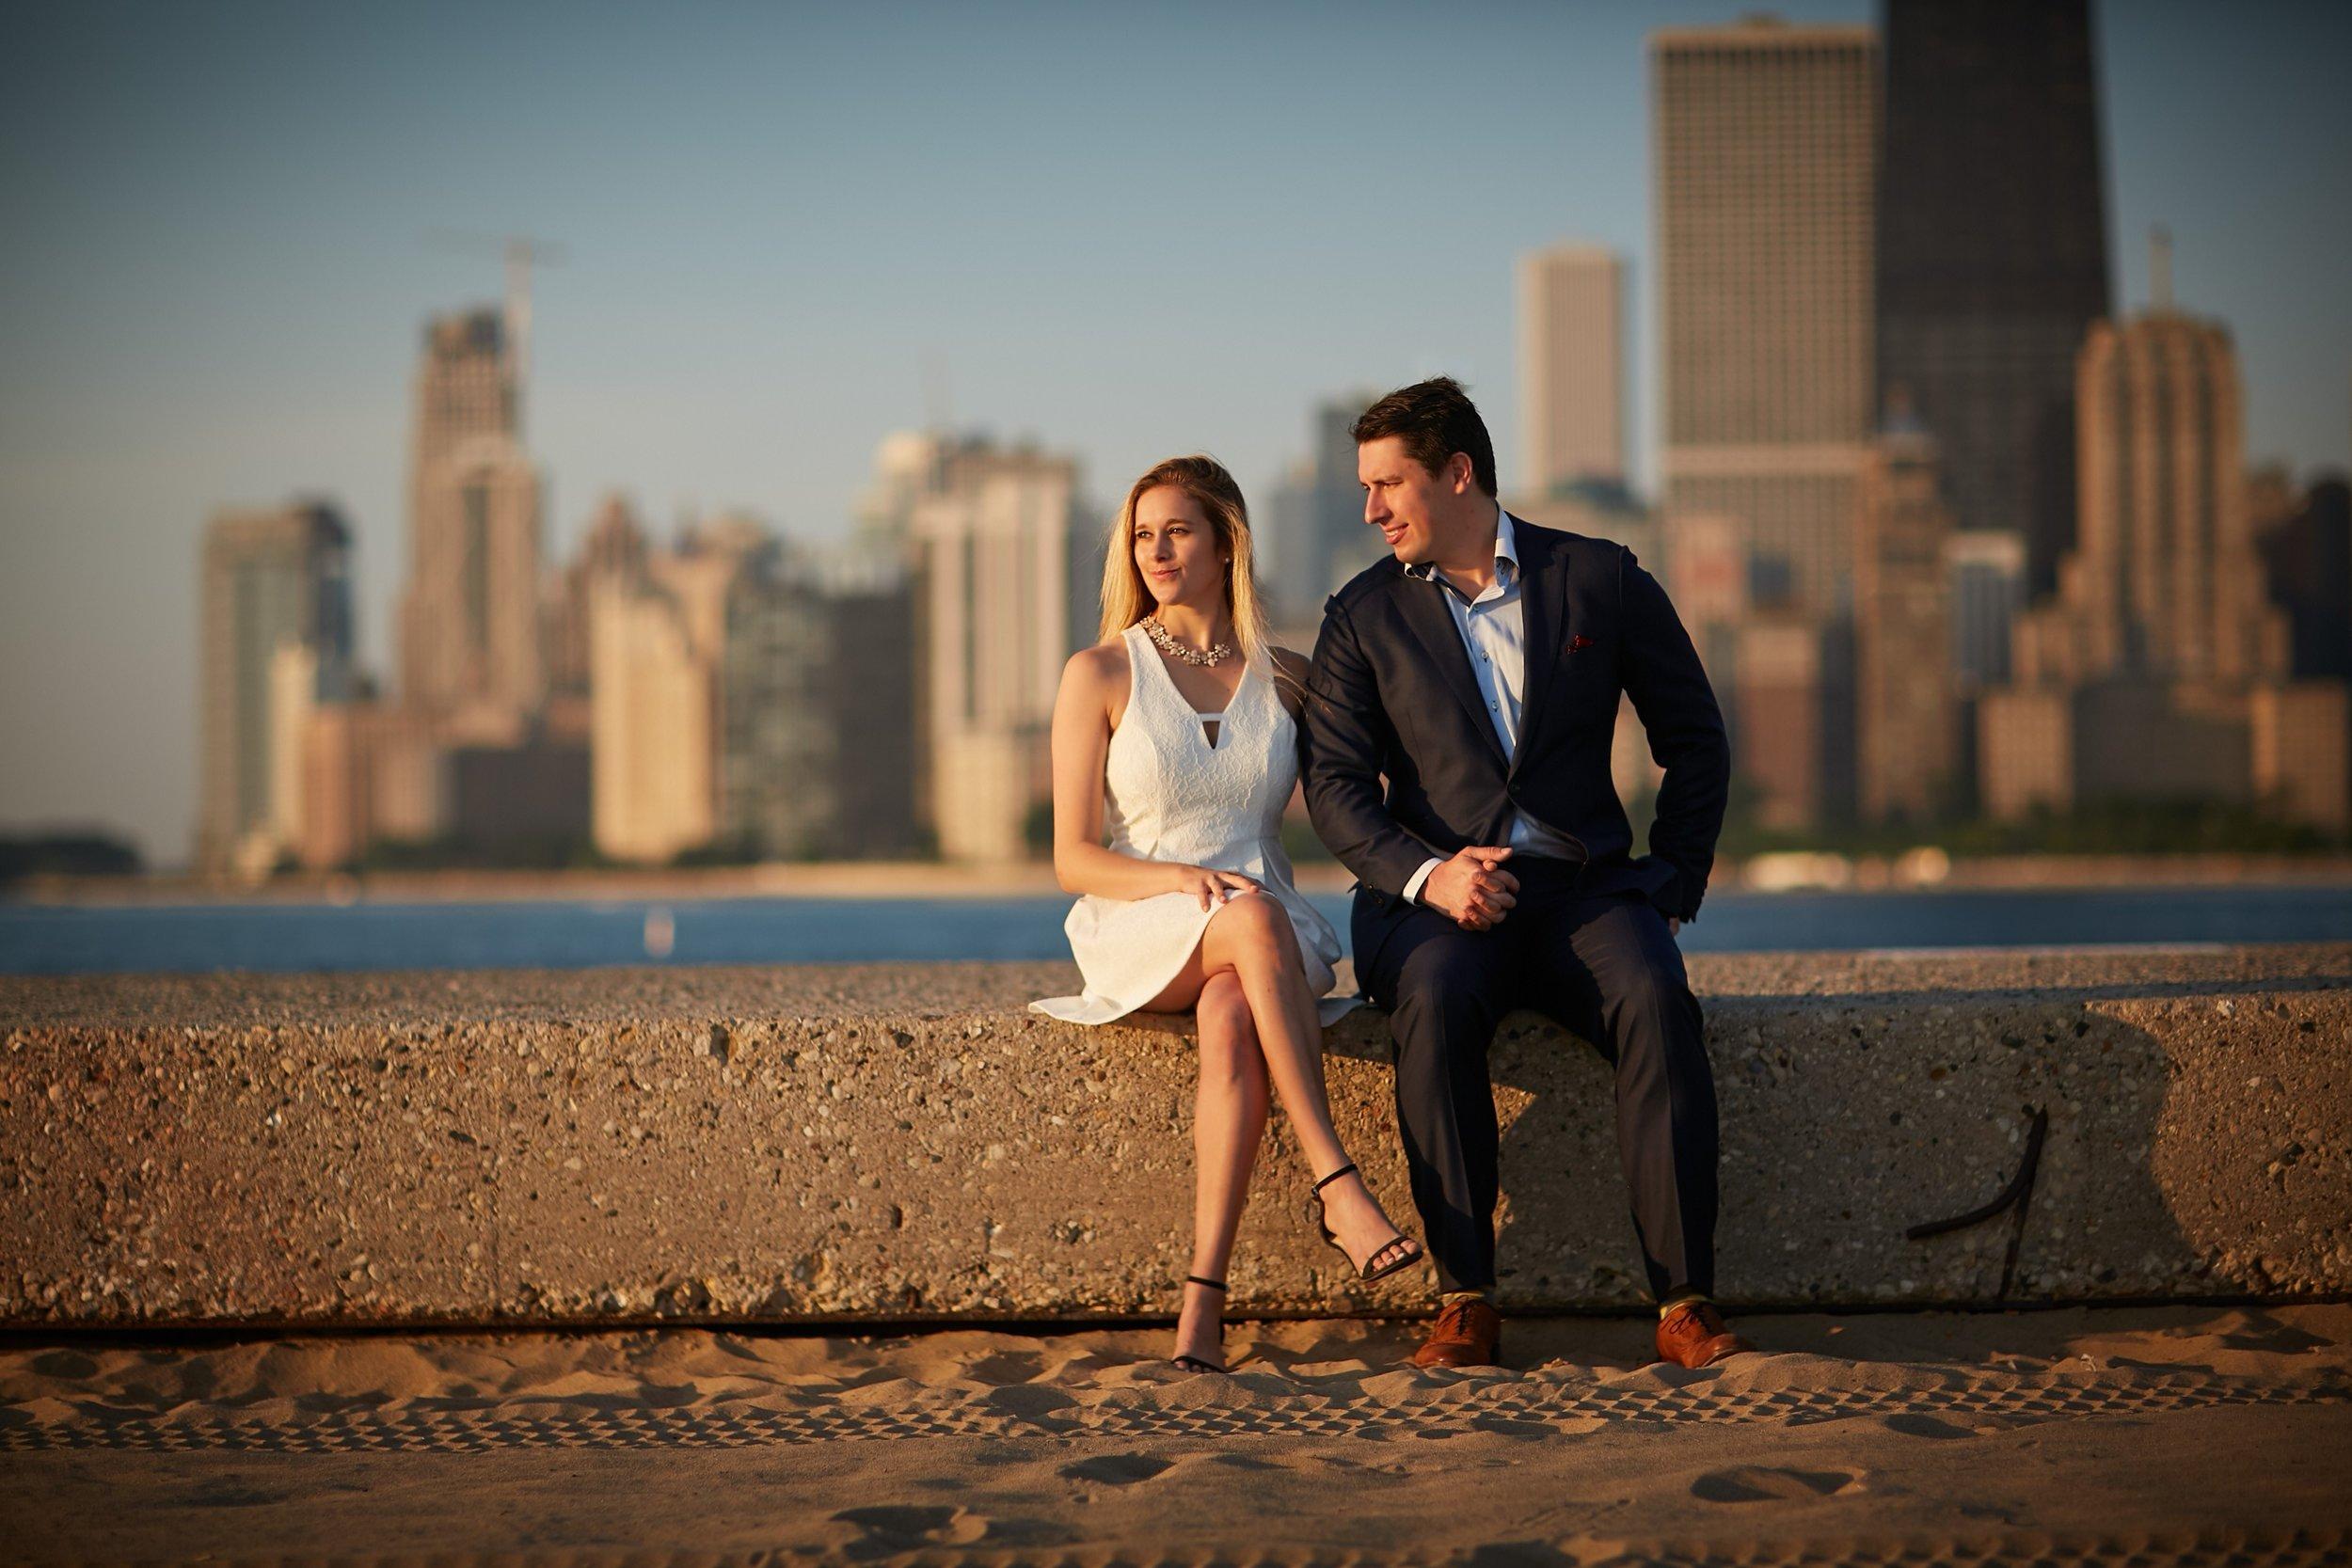 engaged couple photo chicago skyline beach